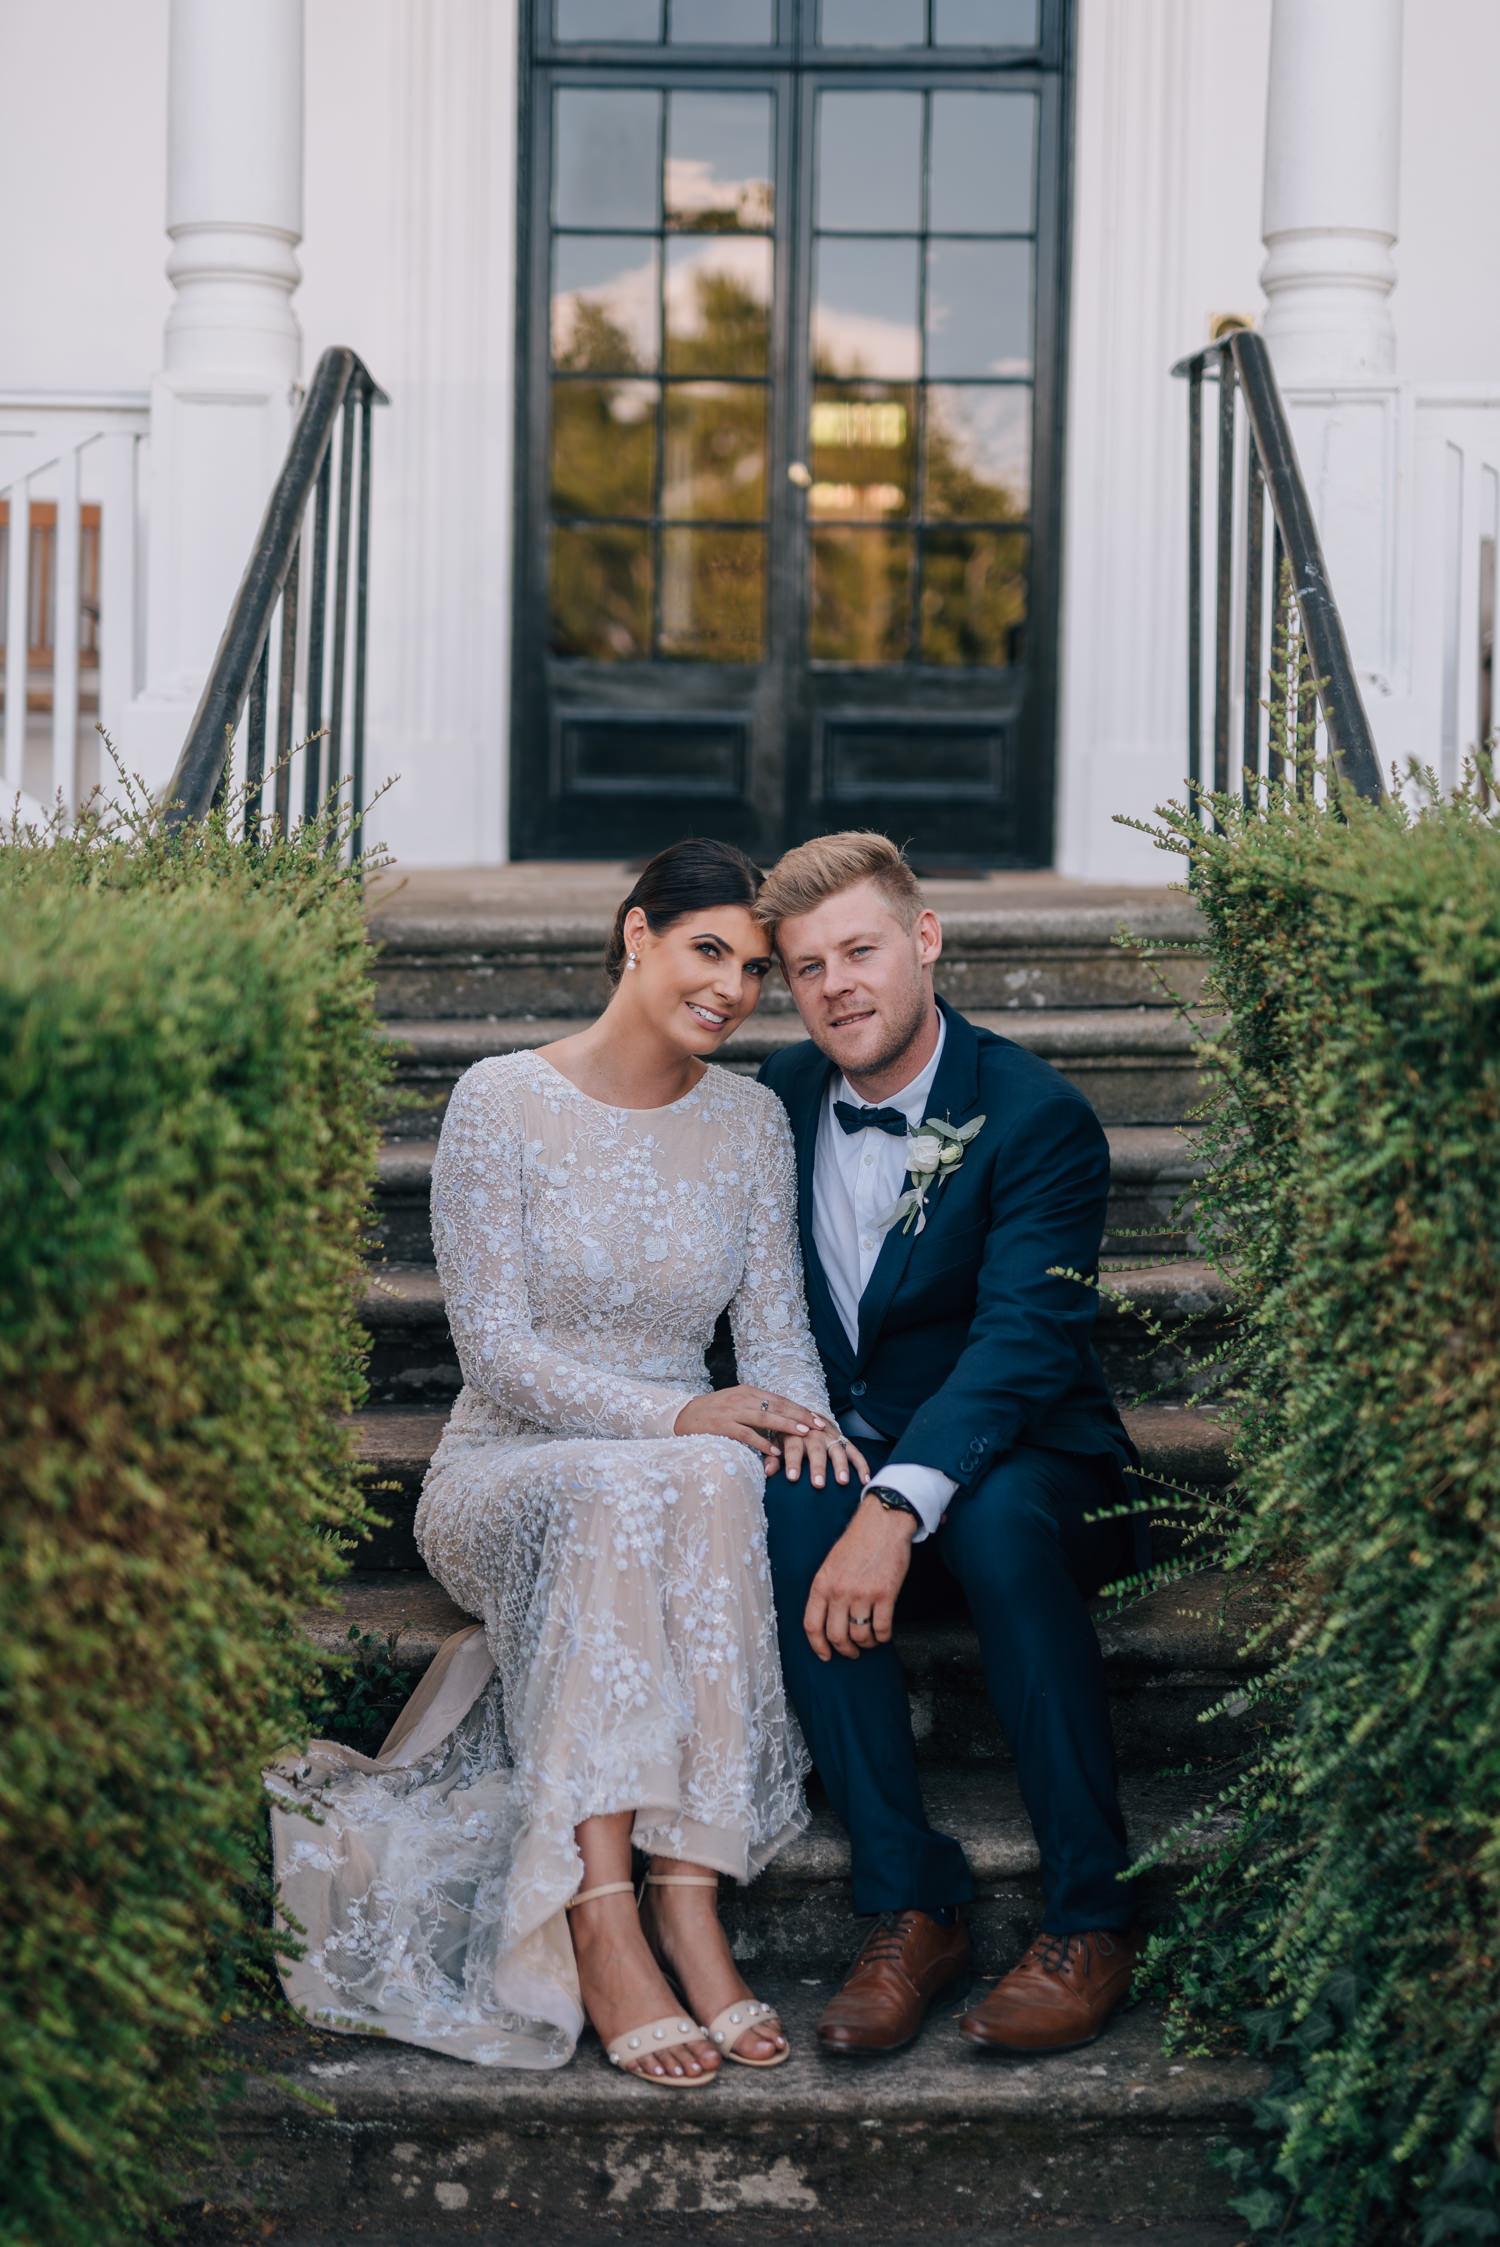 Quamby-Wedding-Photography-116.jpg